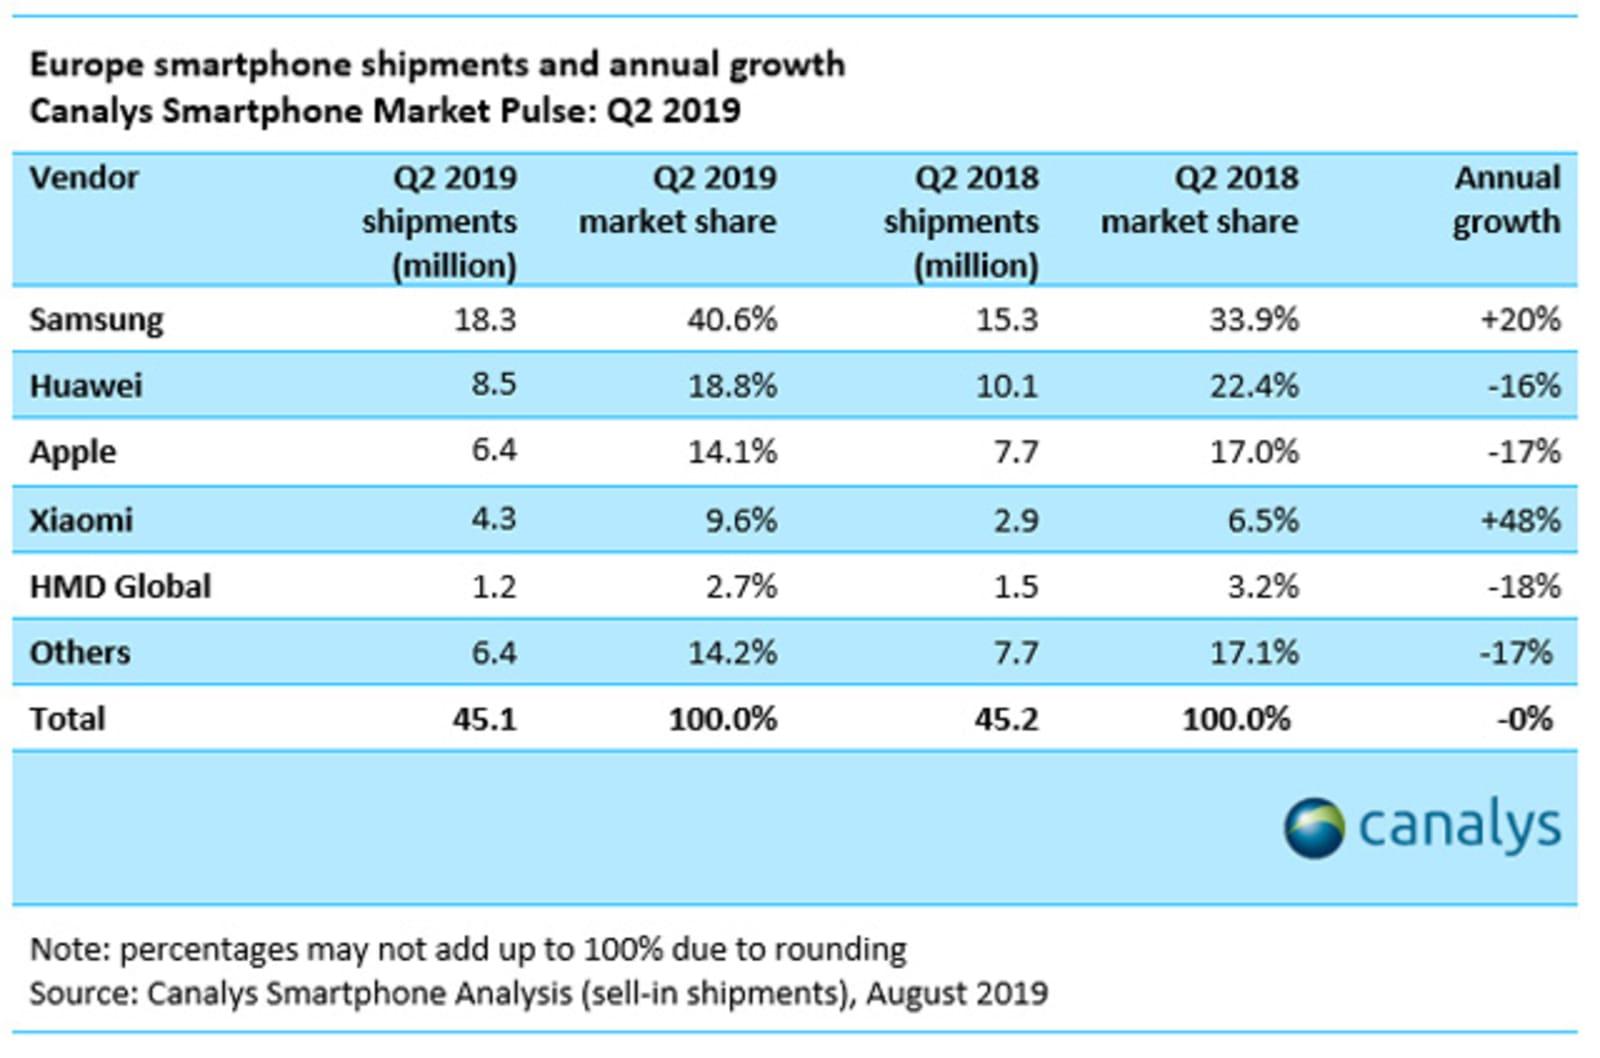 Smartphone market share in Europe Q2 2019